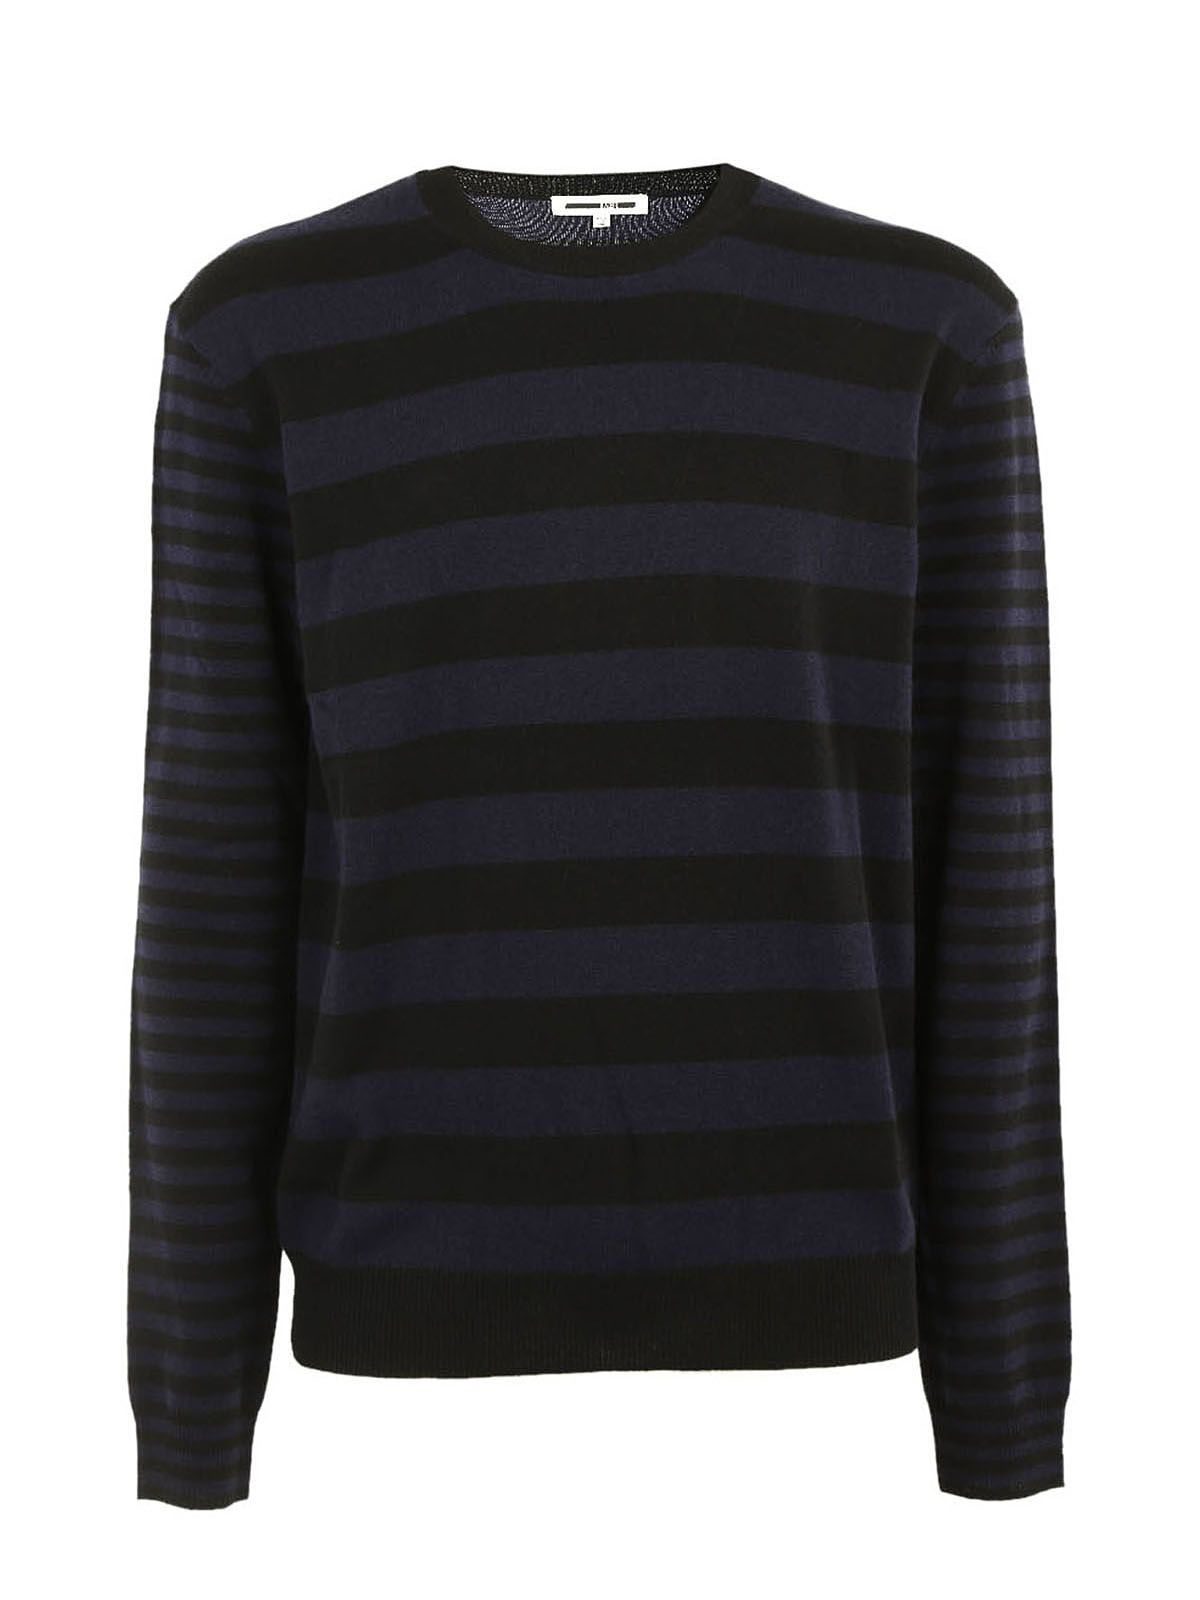 Mcq Alexander Mcqueen Horizontal Stripe Sweater